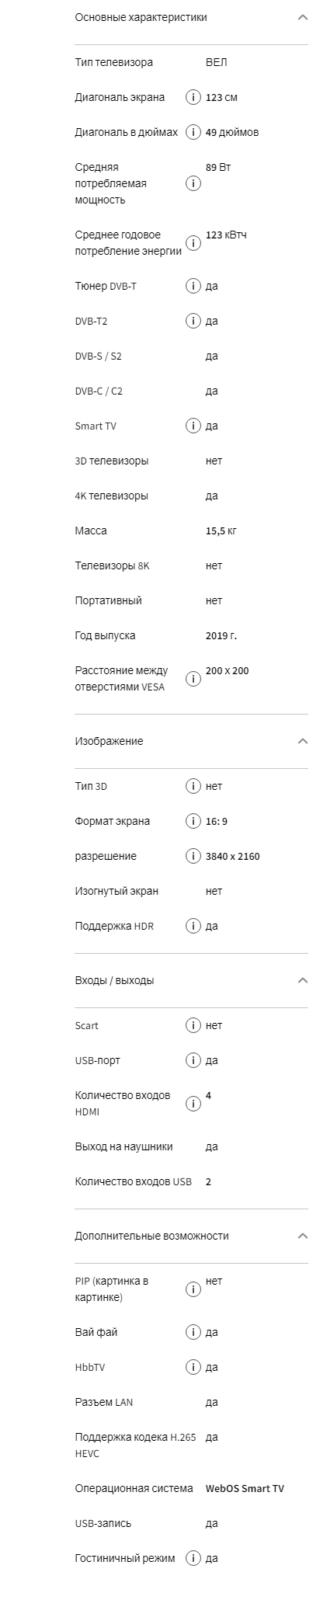 2021 03 27 185442